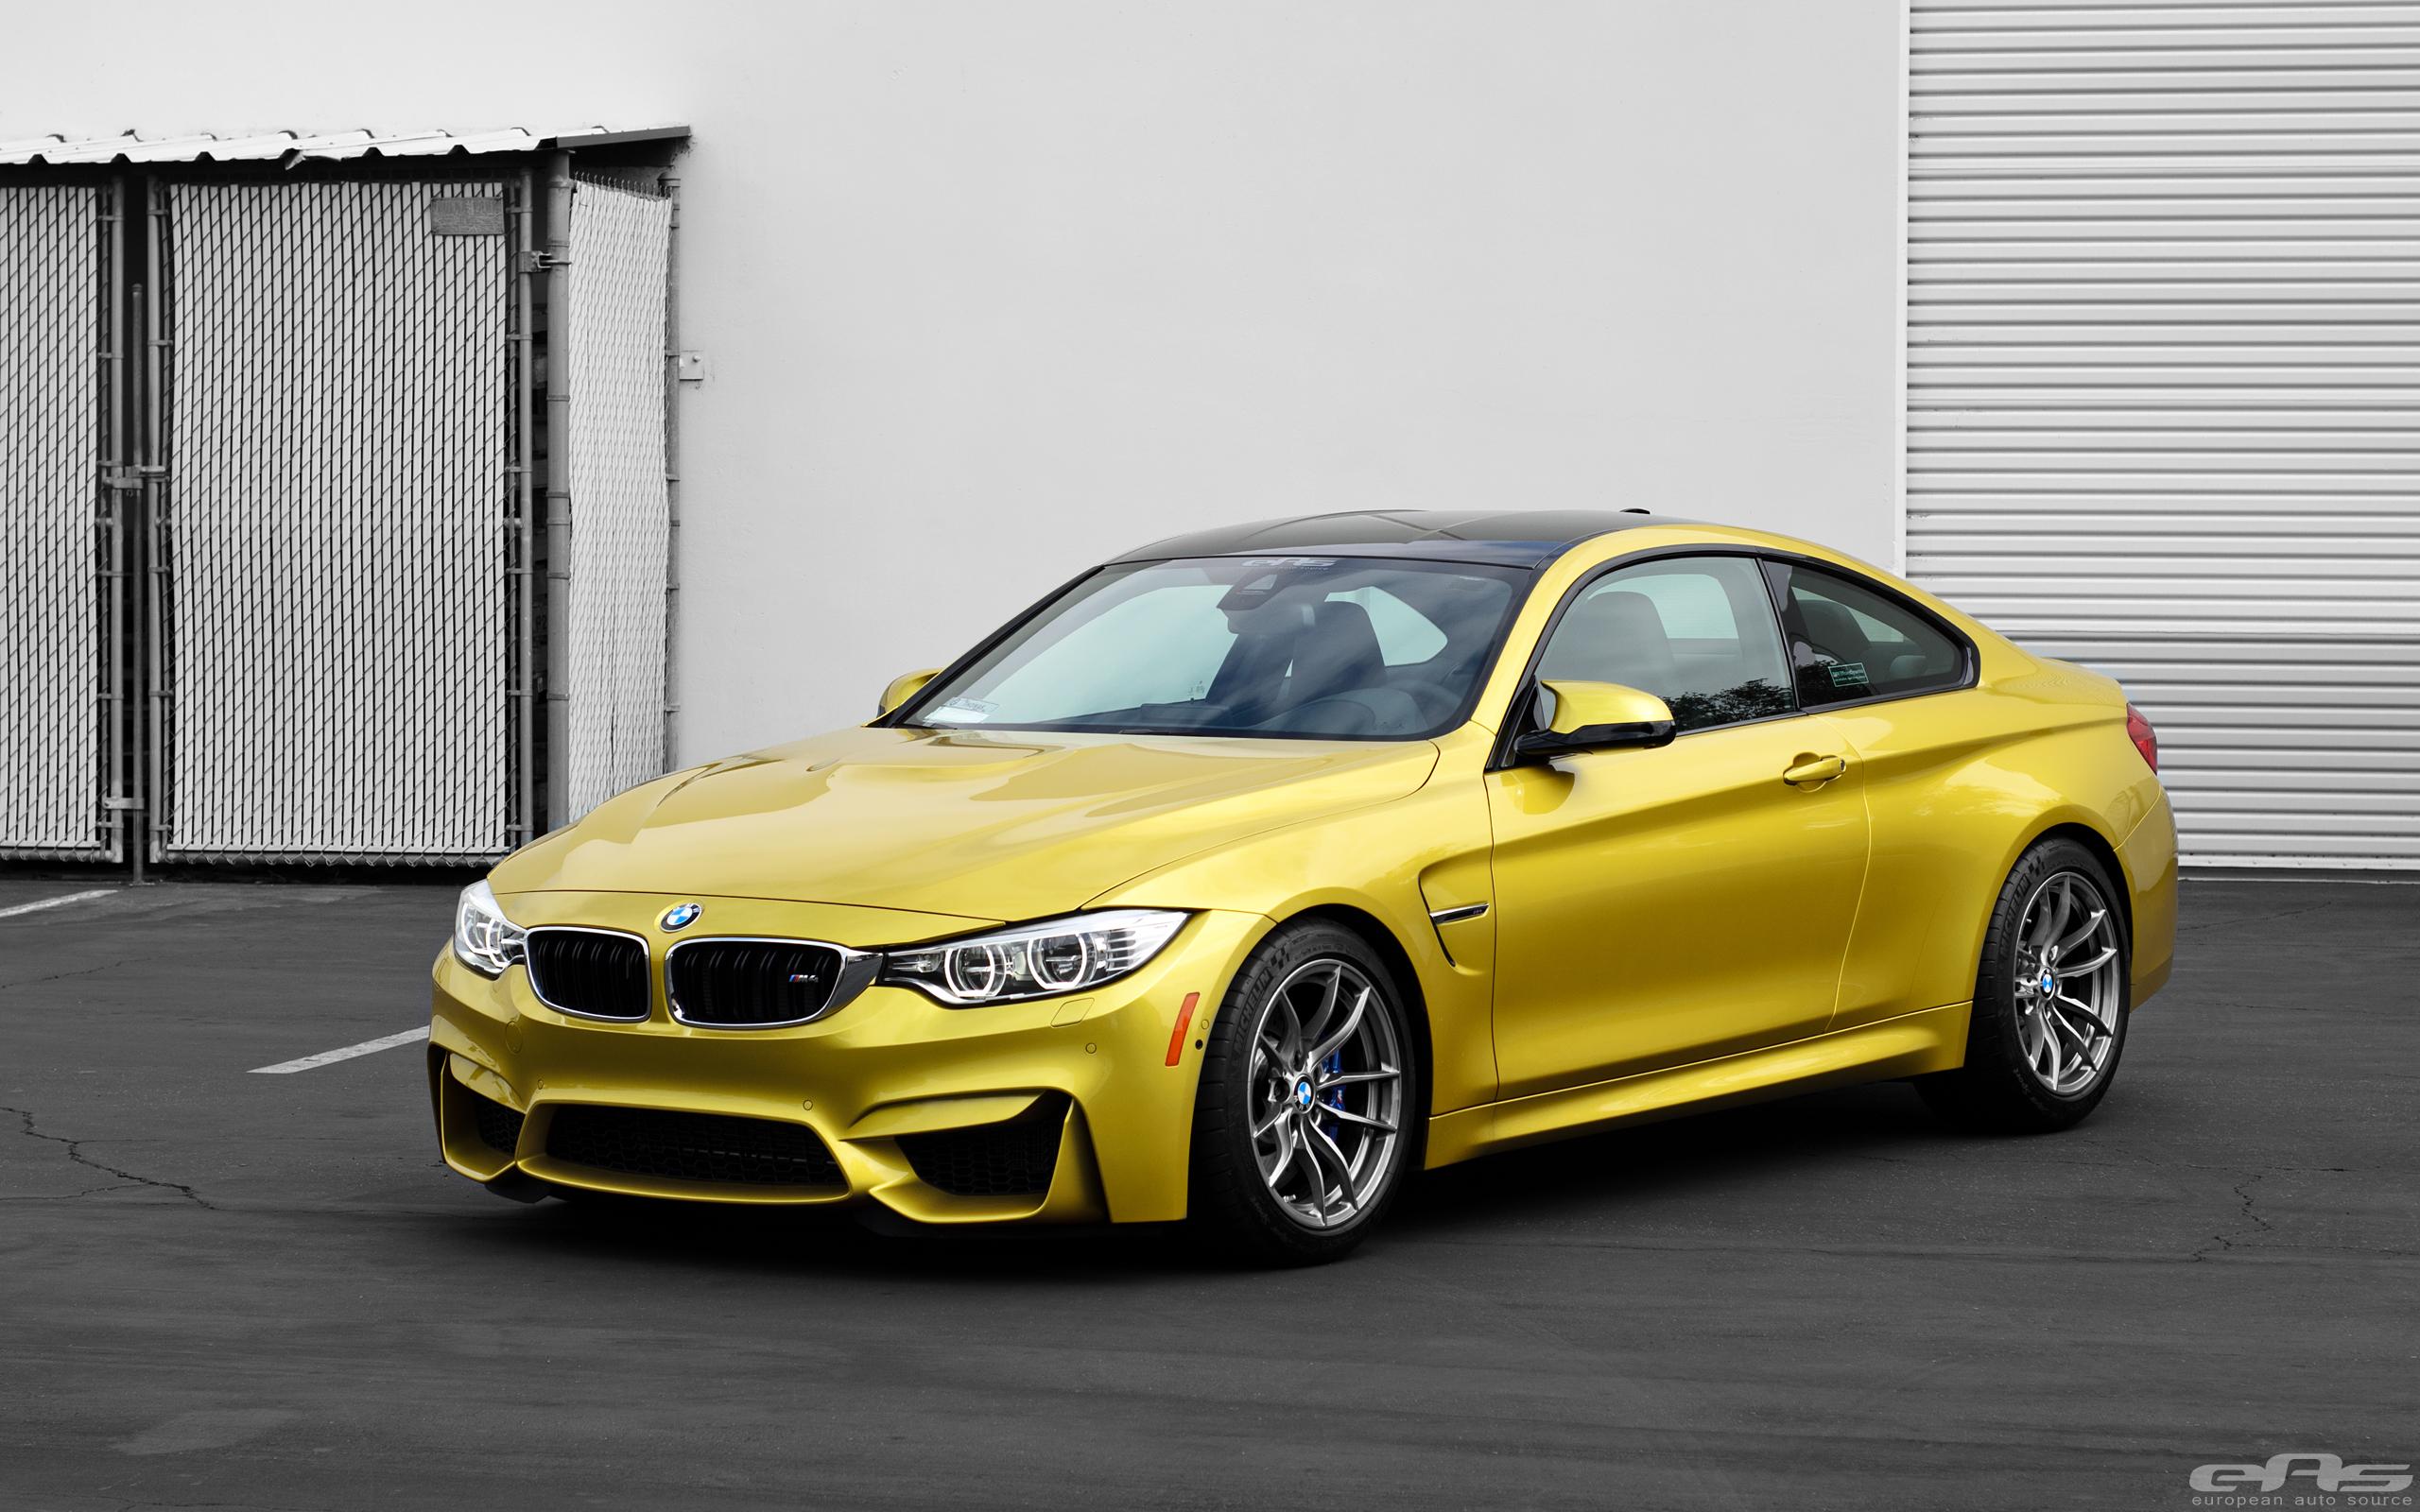 Austin Yellow Bmw F82 M4 2560 X 1600 Carporn